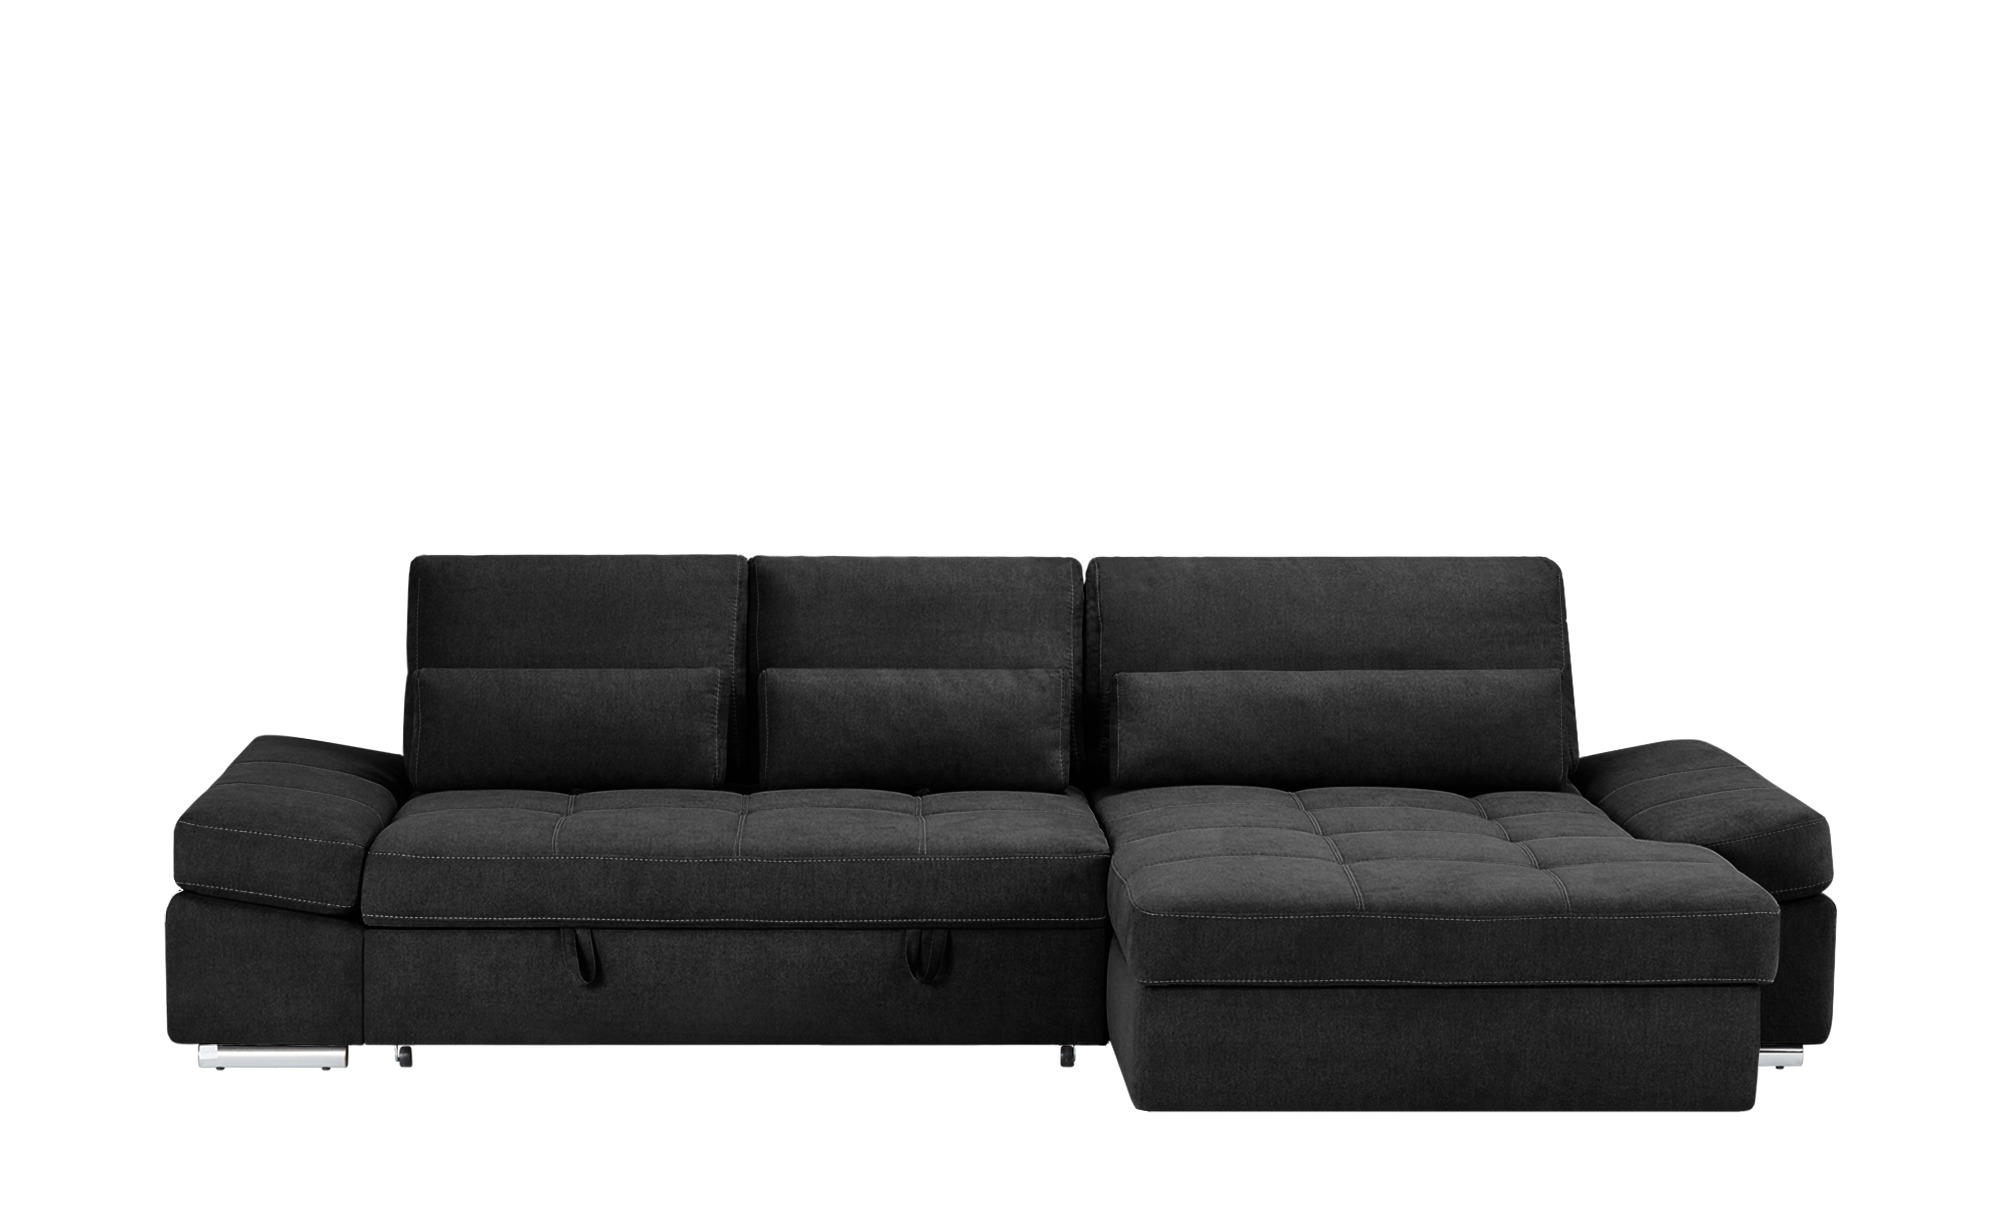 Ecksofa hudson breite h he 95 cm schwarz online kaufen for Ecksofa breite 200 cm